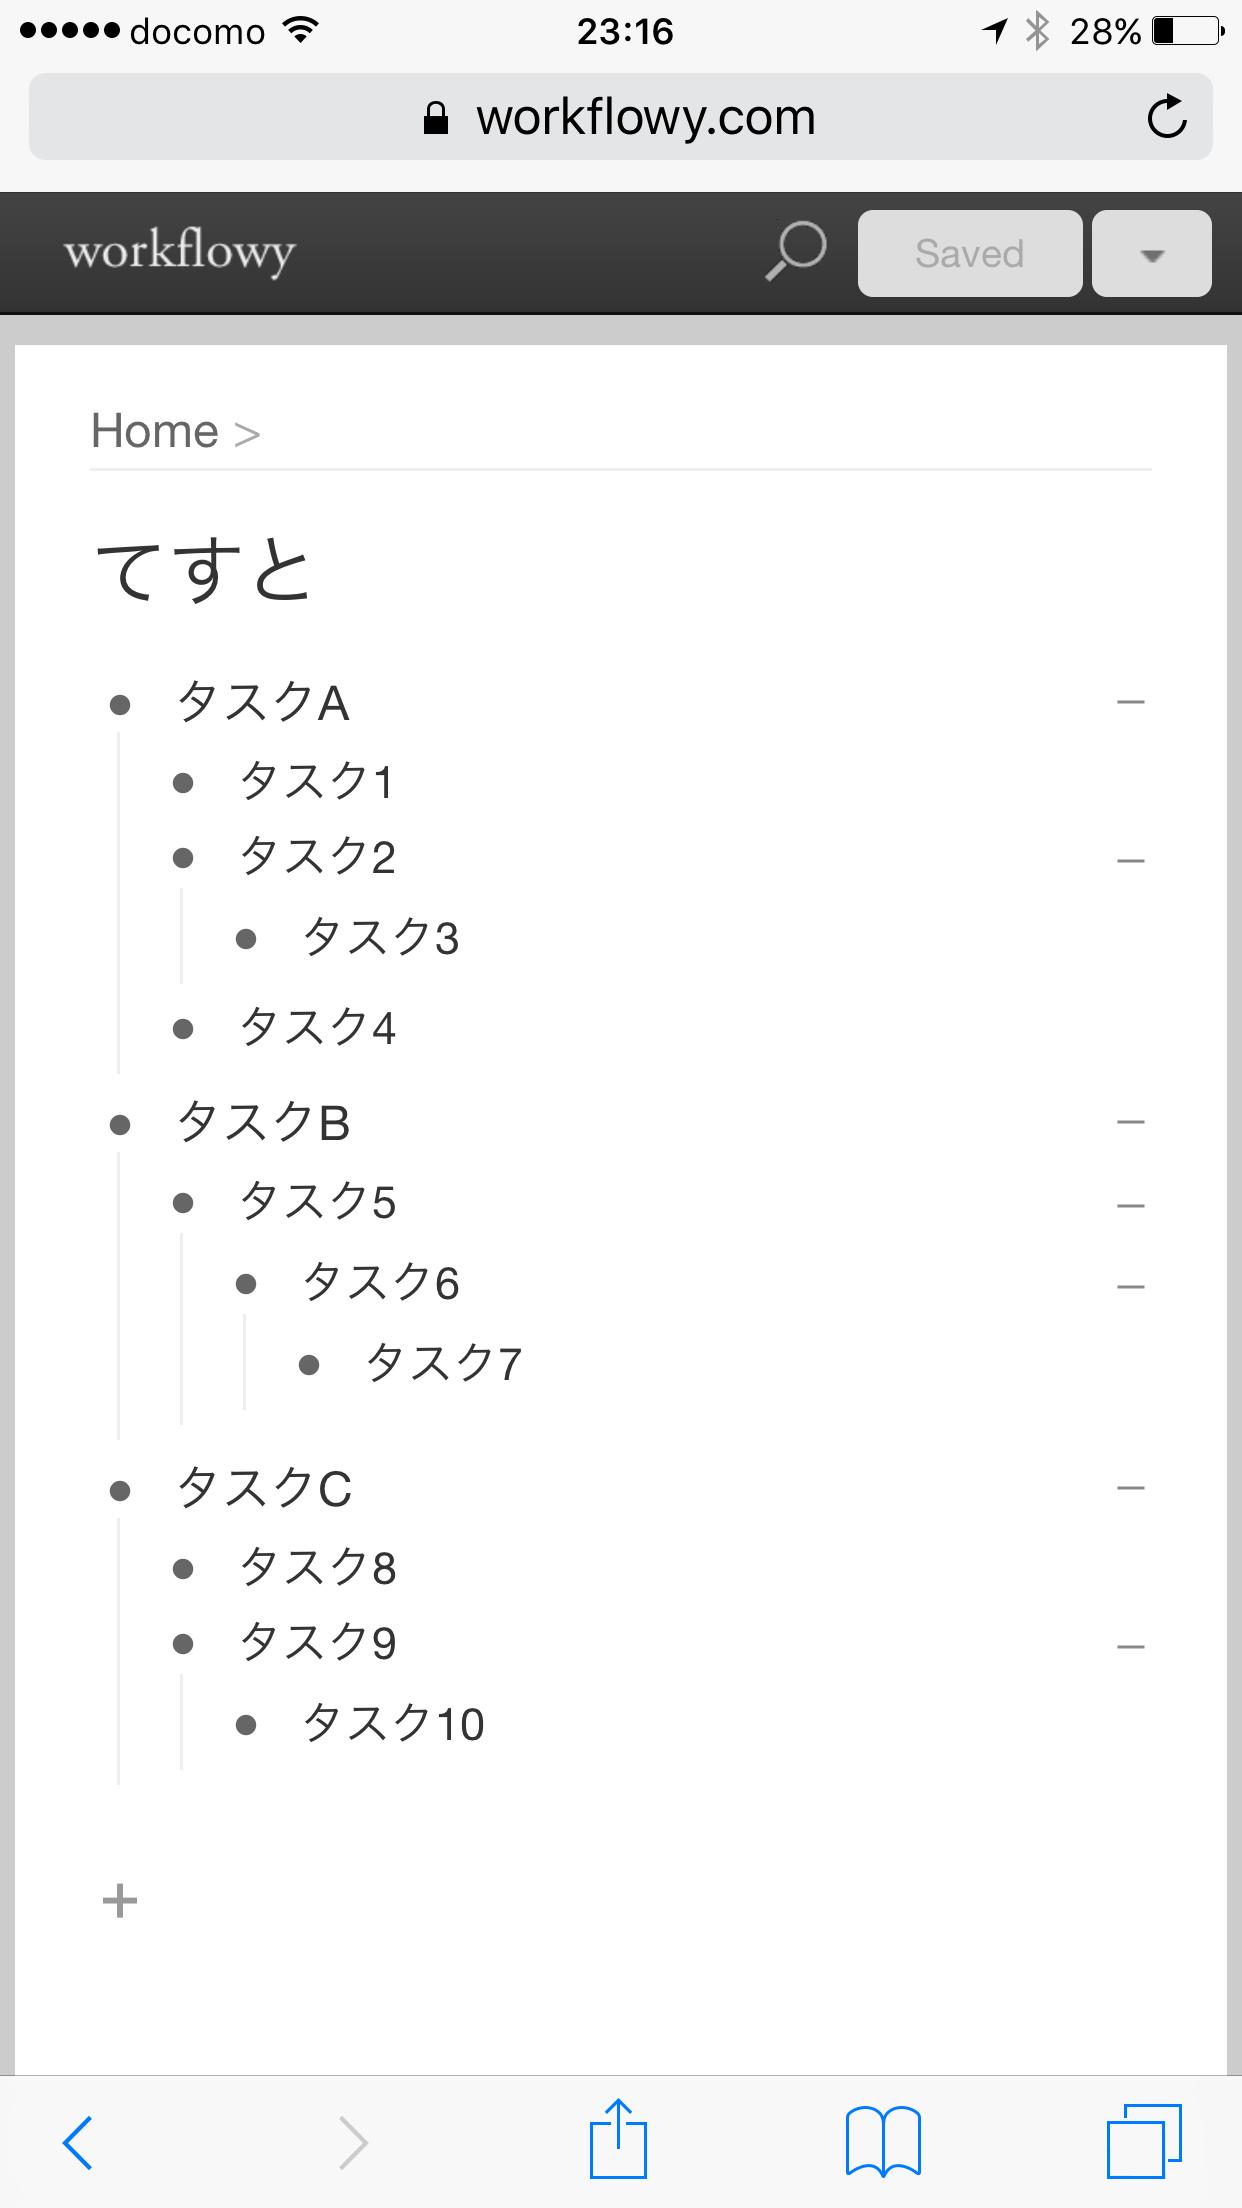 f:id:sorashima:20170331233003p:plain:w311